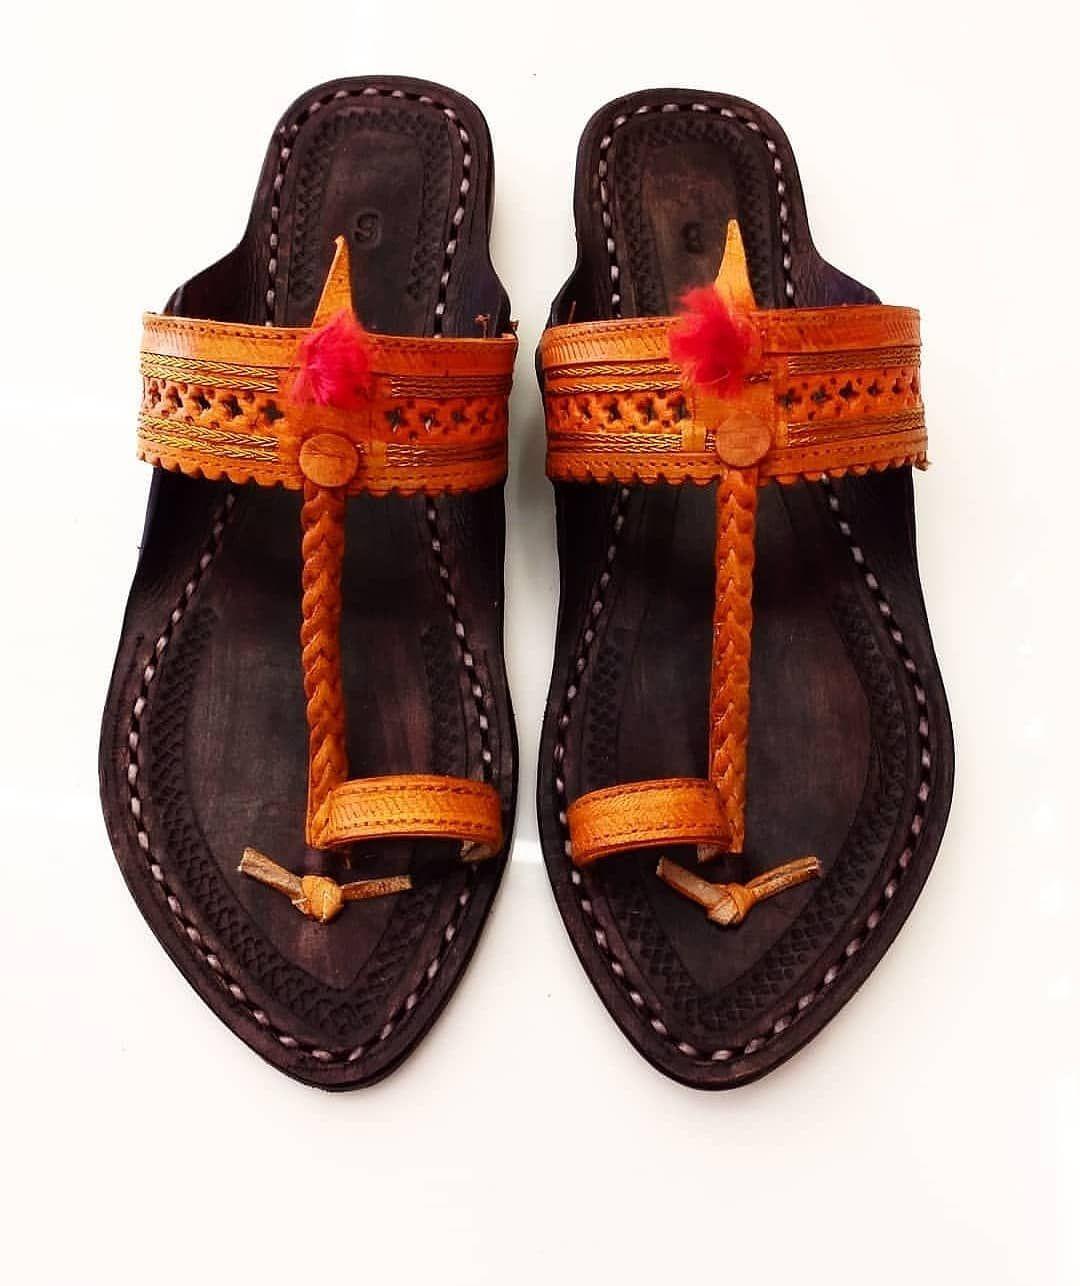 US 9 men Sandal Handmade Leather Shoes Flip Flop traditional Kolhapuri Chappal